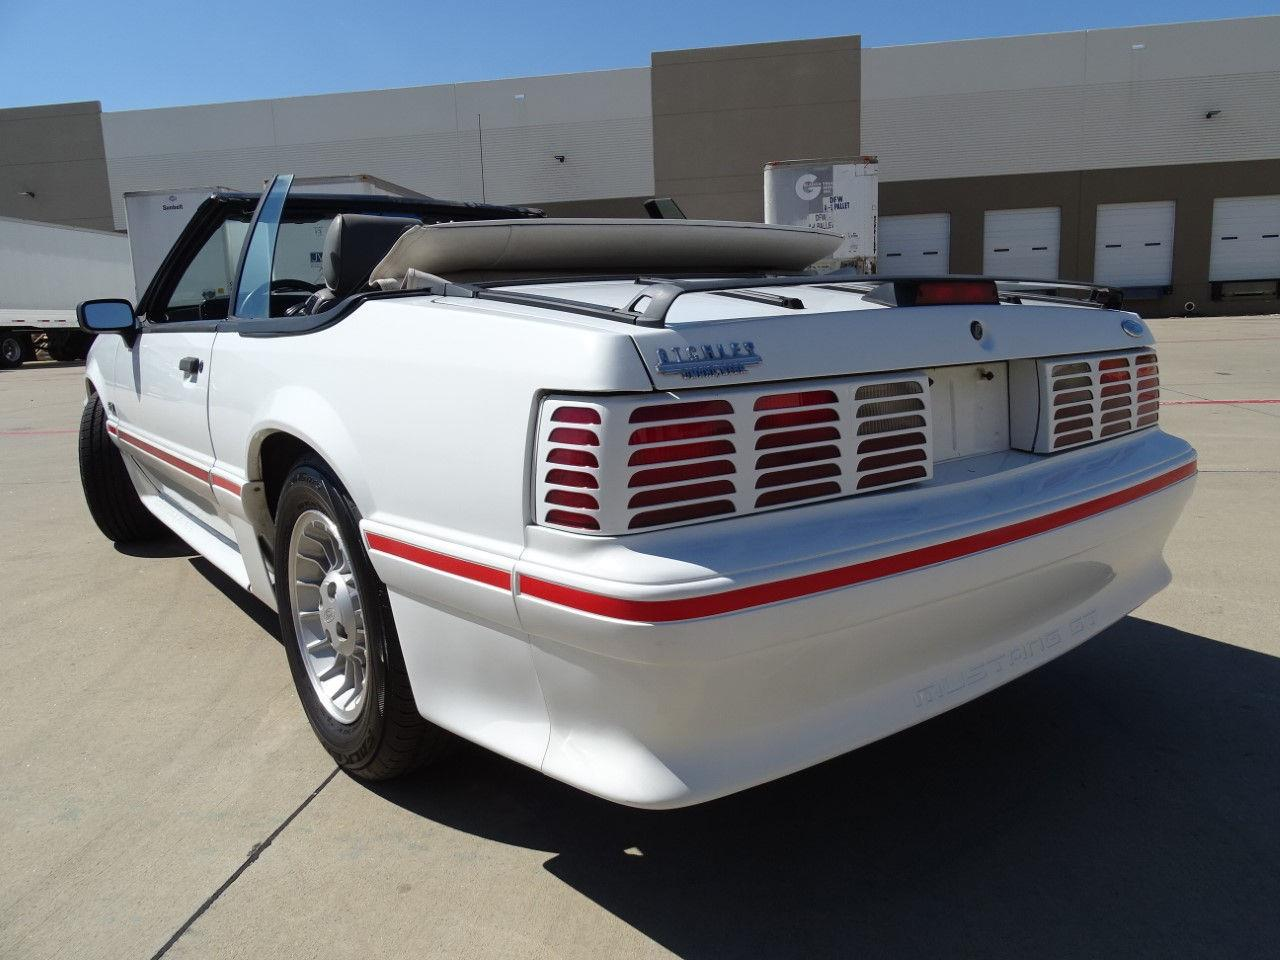 1989 Mustang Gt For Sale Craigslist